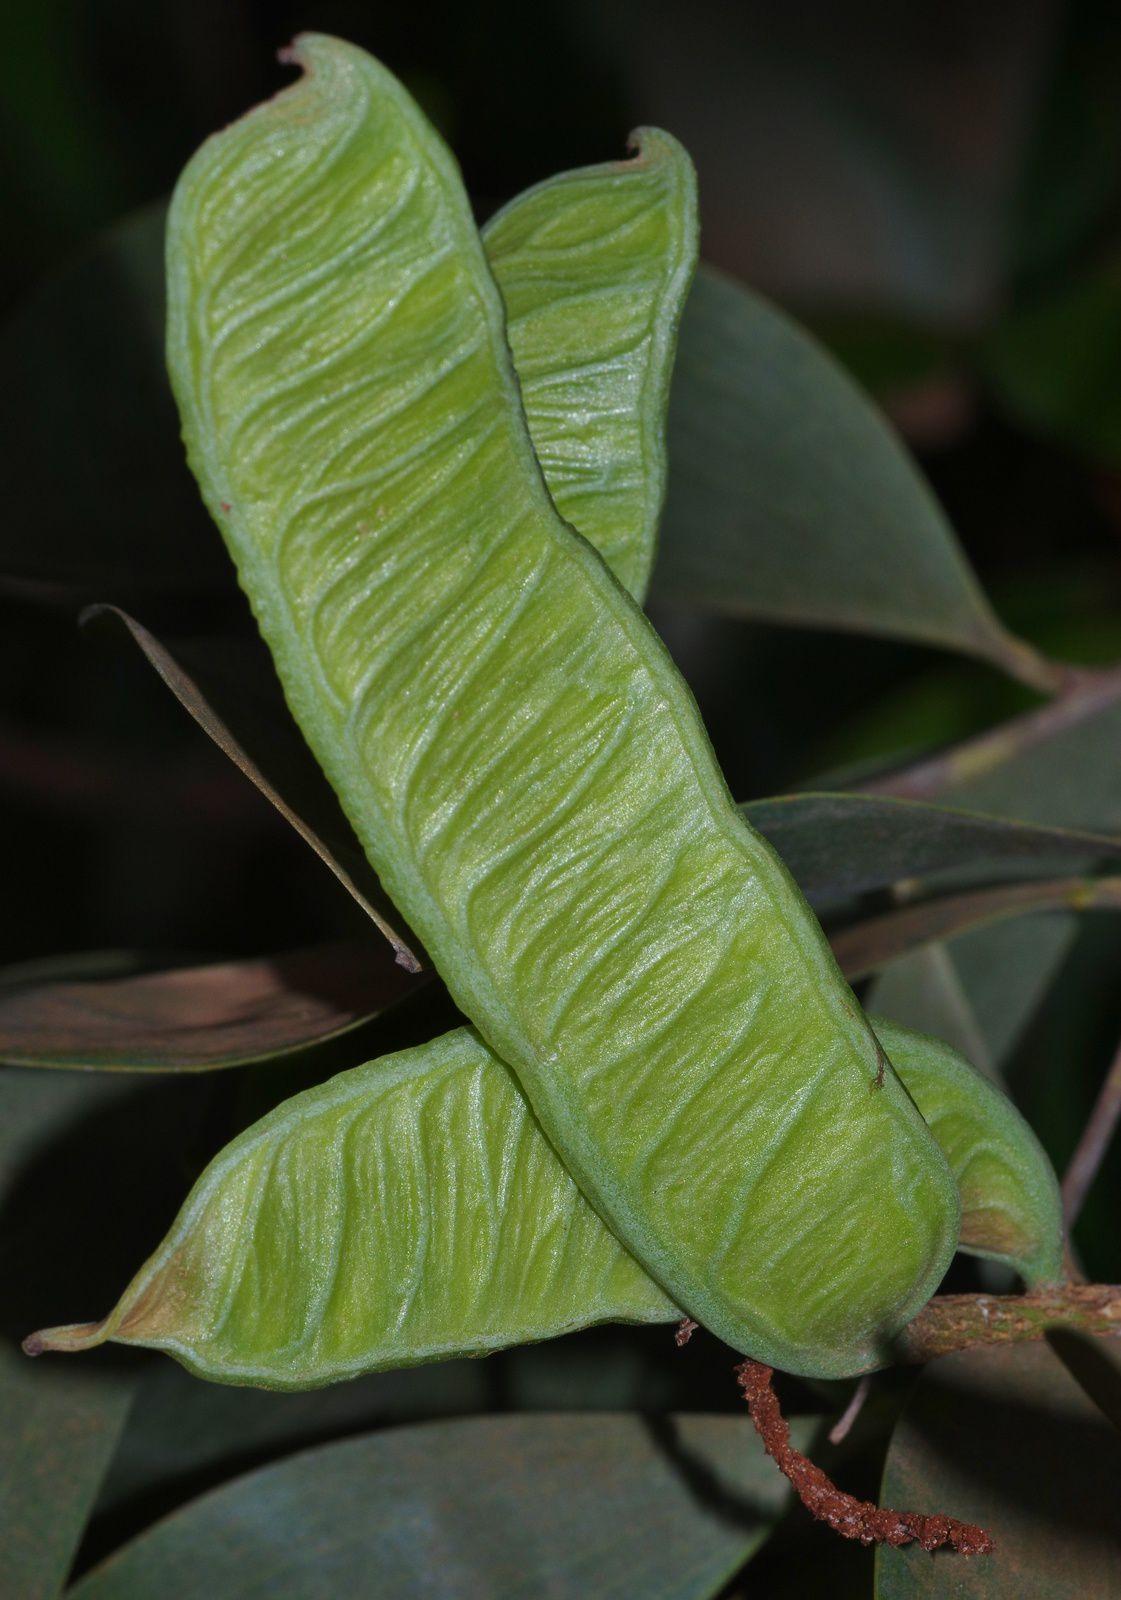 Acacia crassicarpa